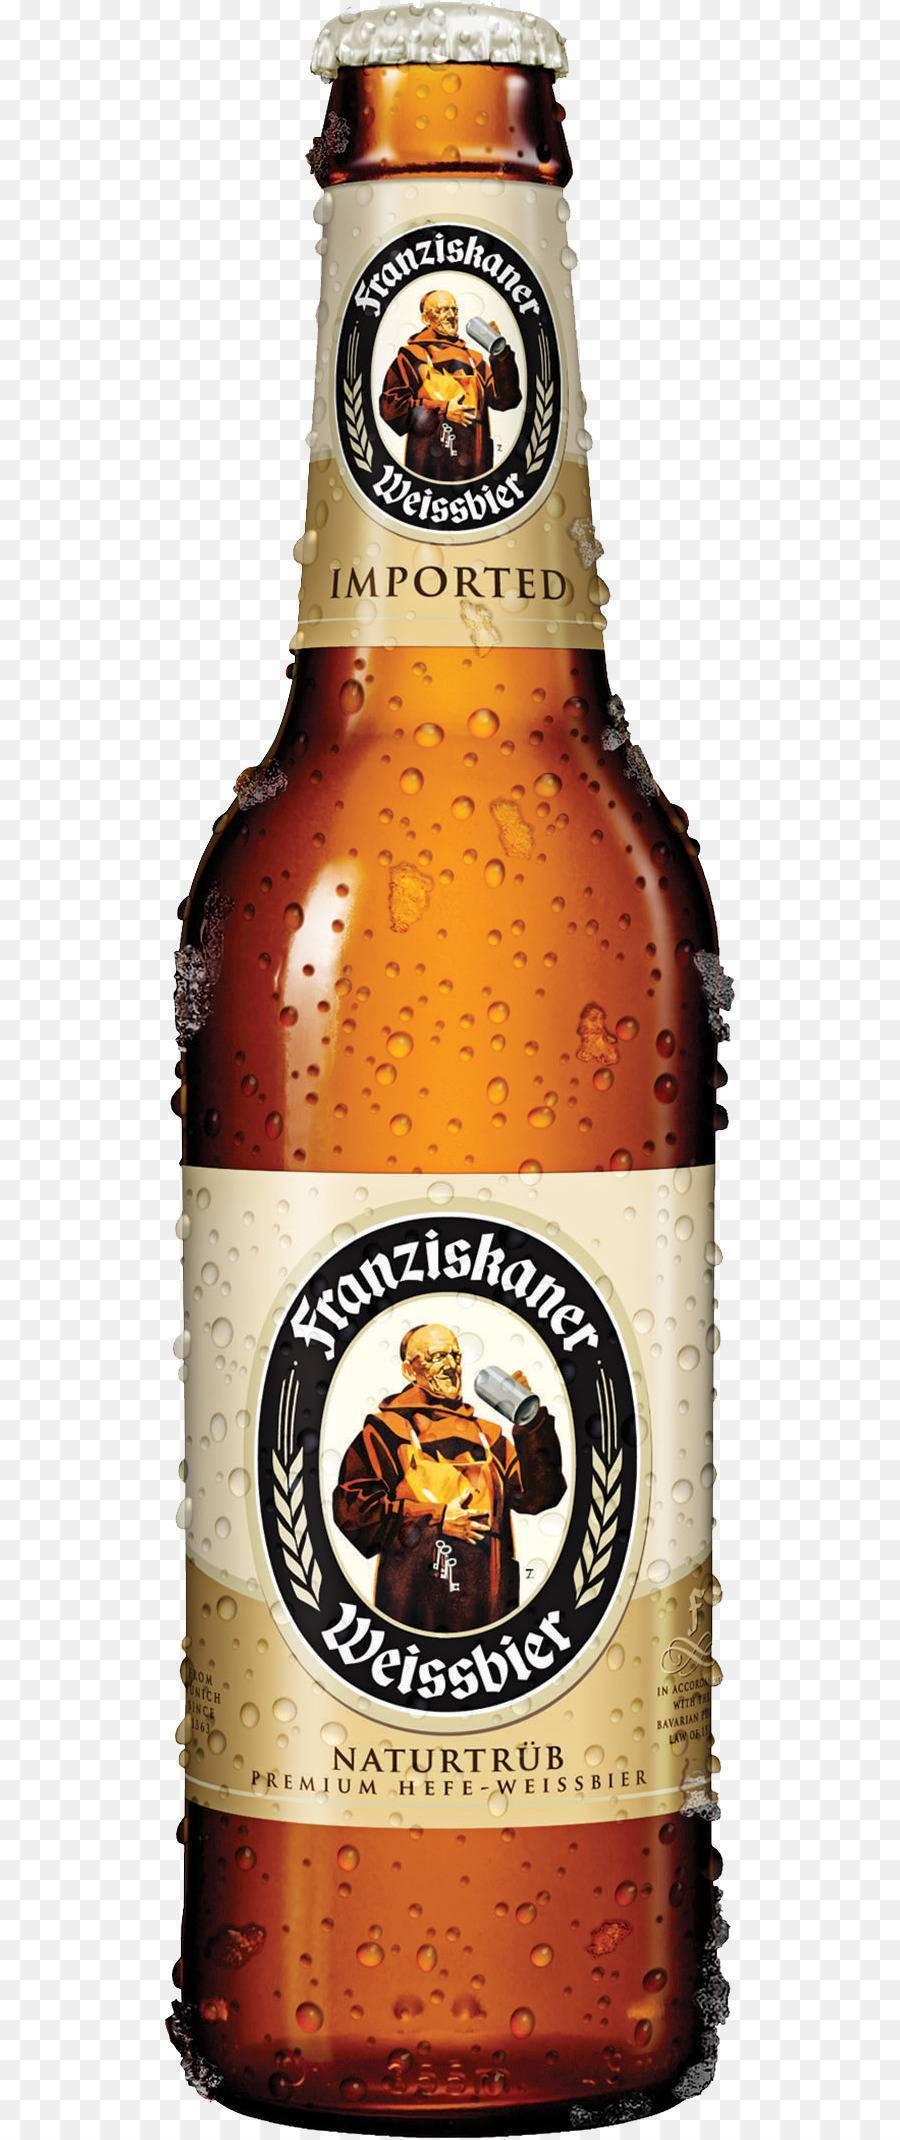 Пиво franziskaner (францисканер): обзор линейки бренда